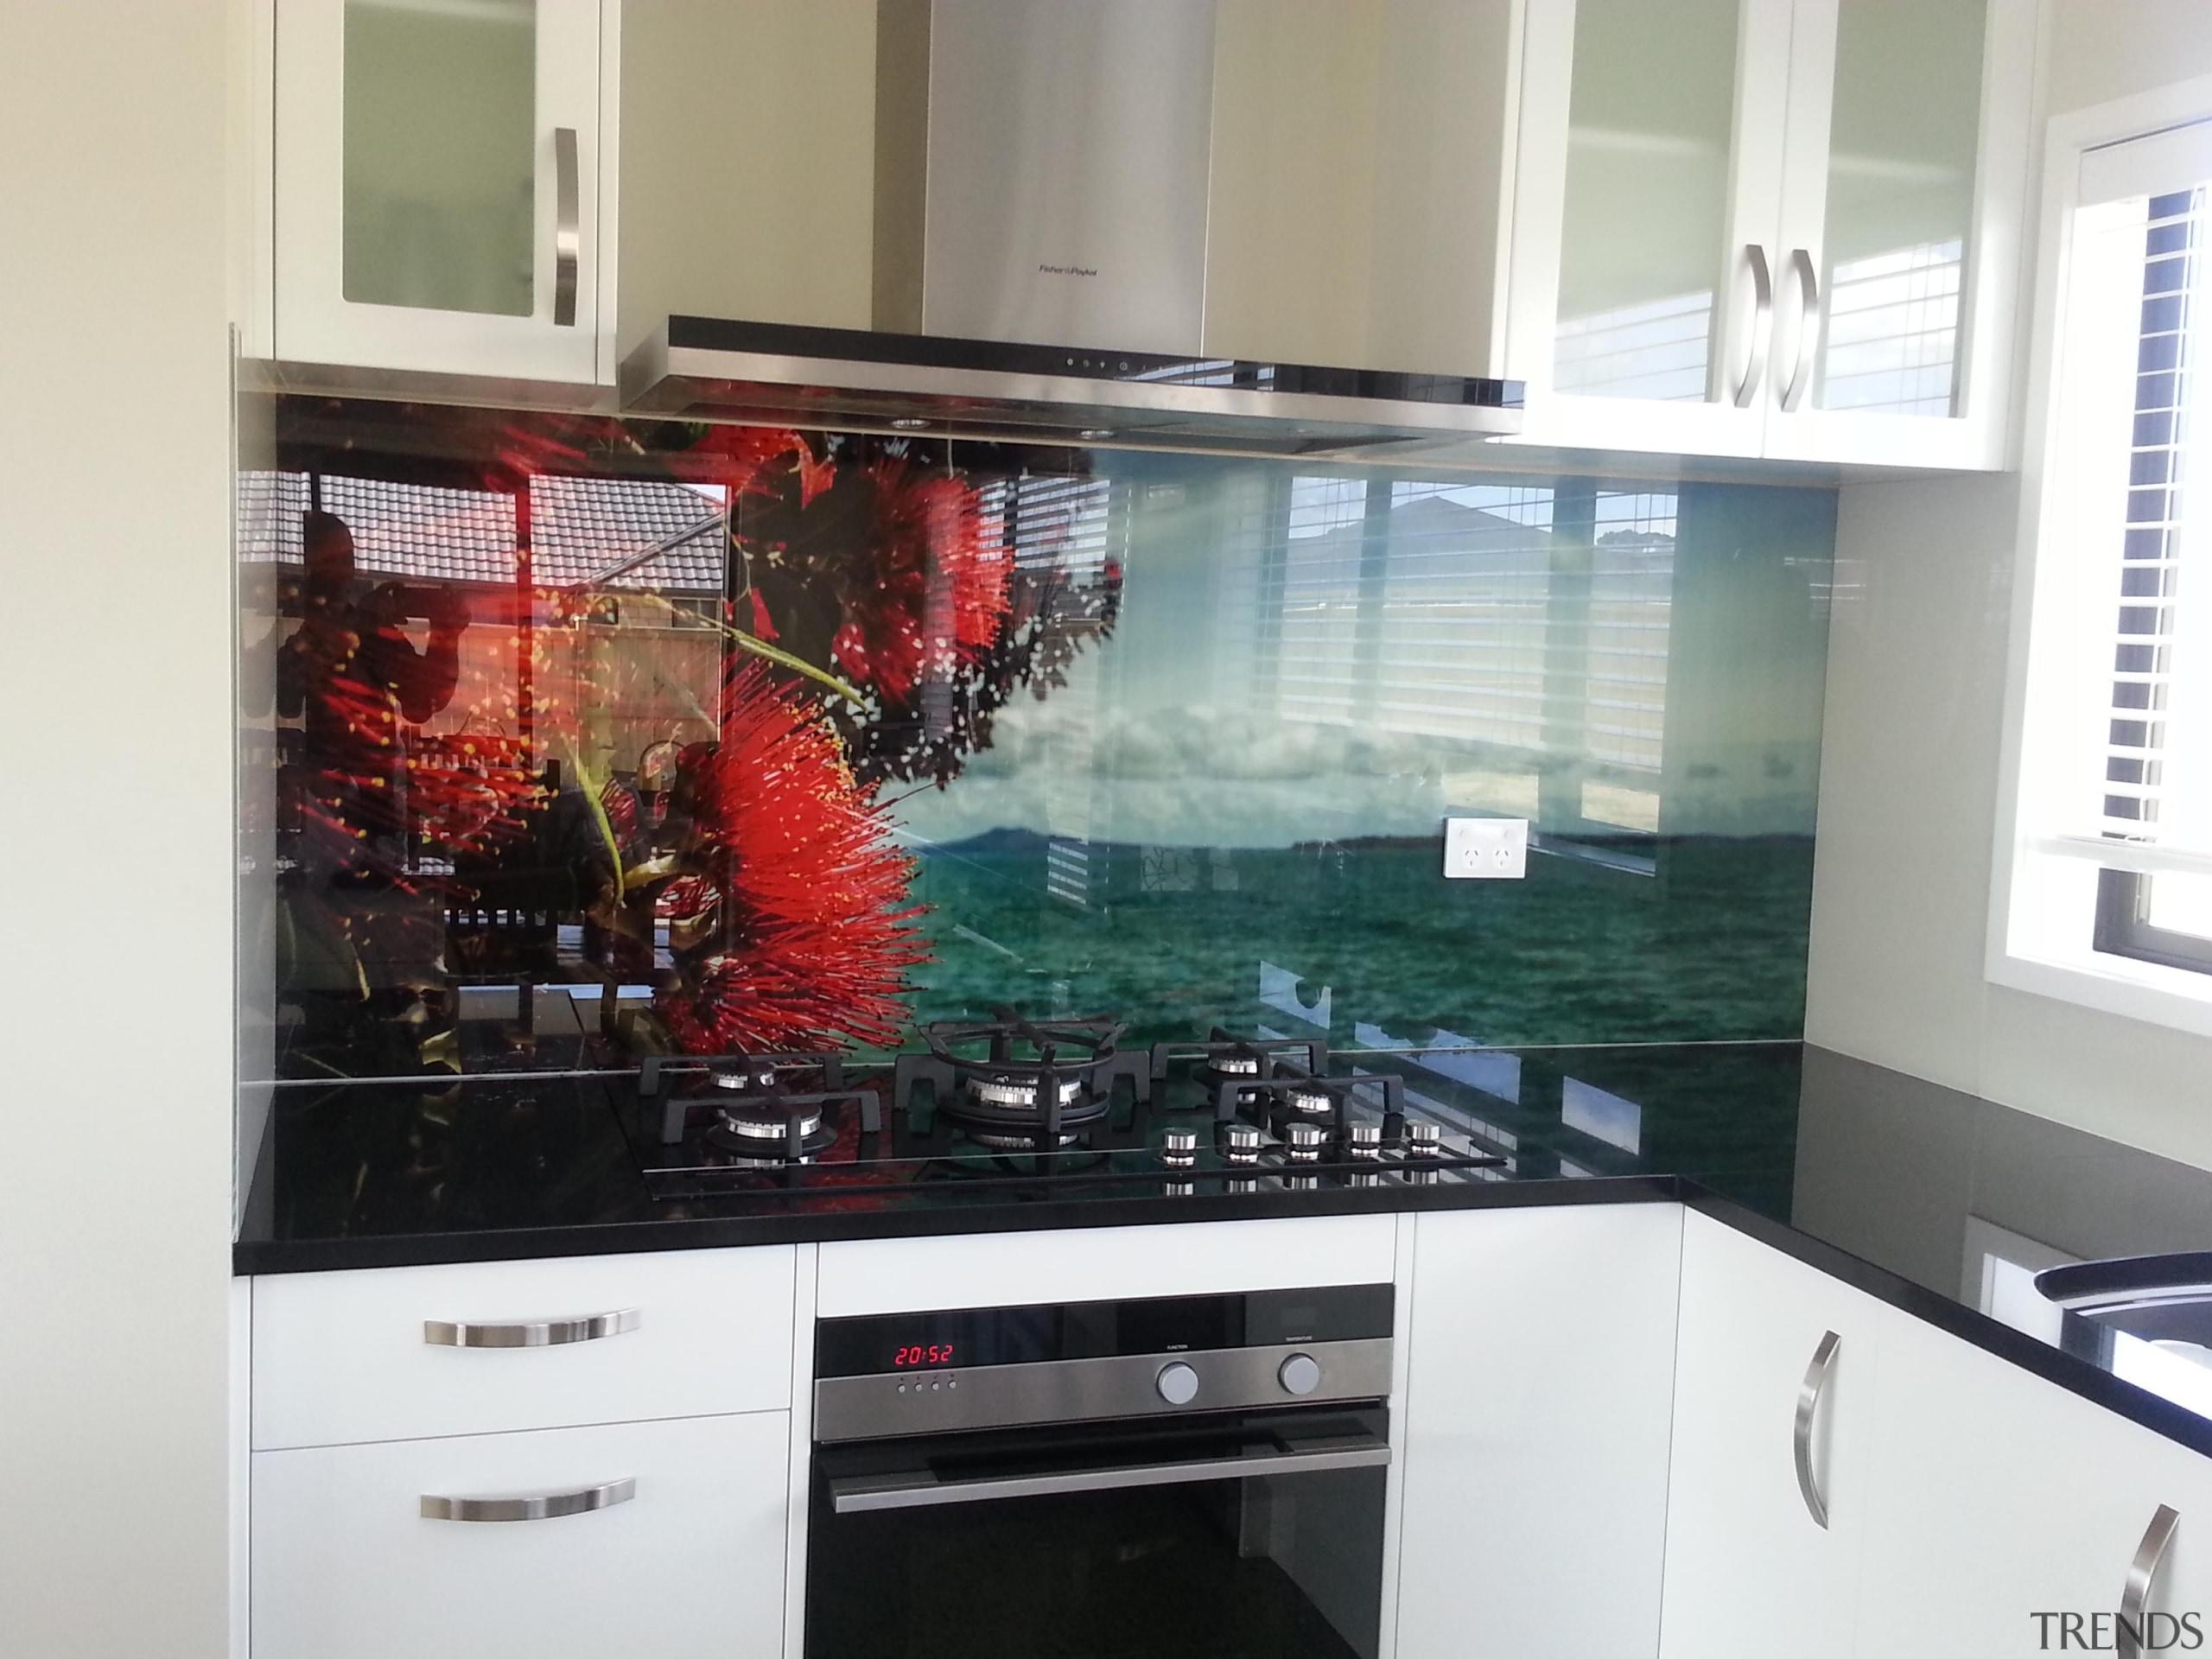 20140228145504.jpg - 20140228145504.jpg - countertop | glass | countertop, glass, interior design, kitchen, room, white